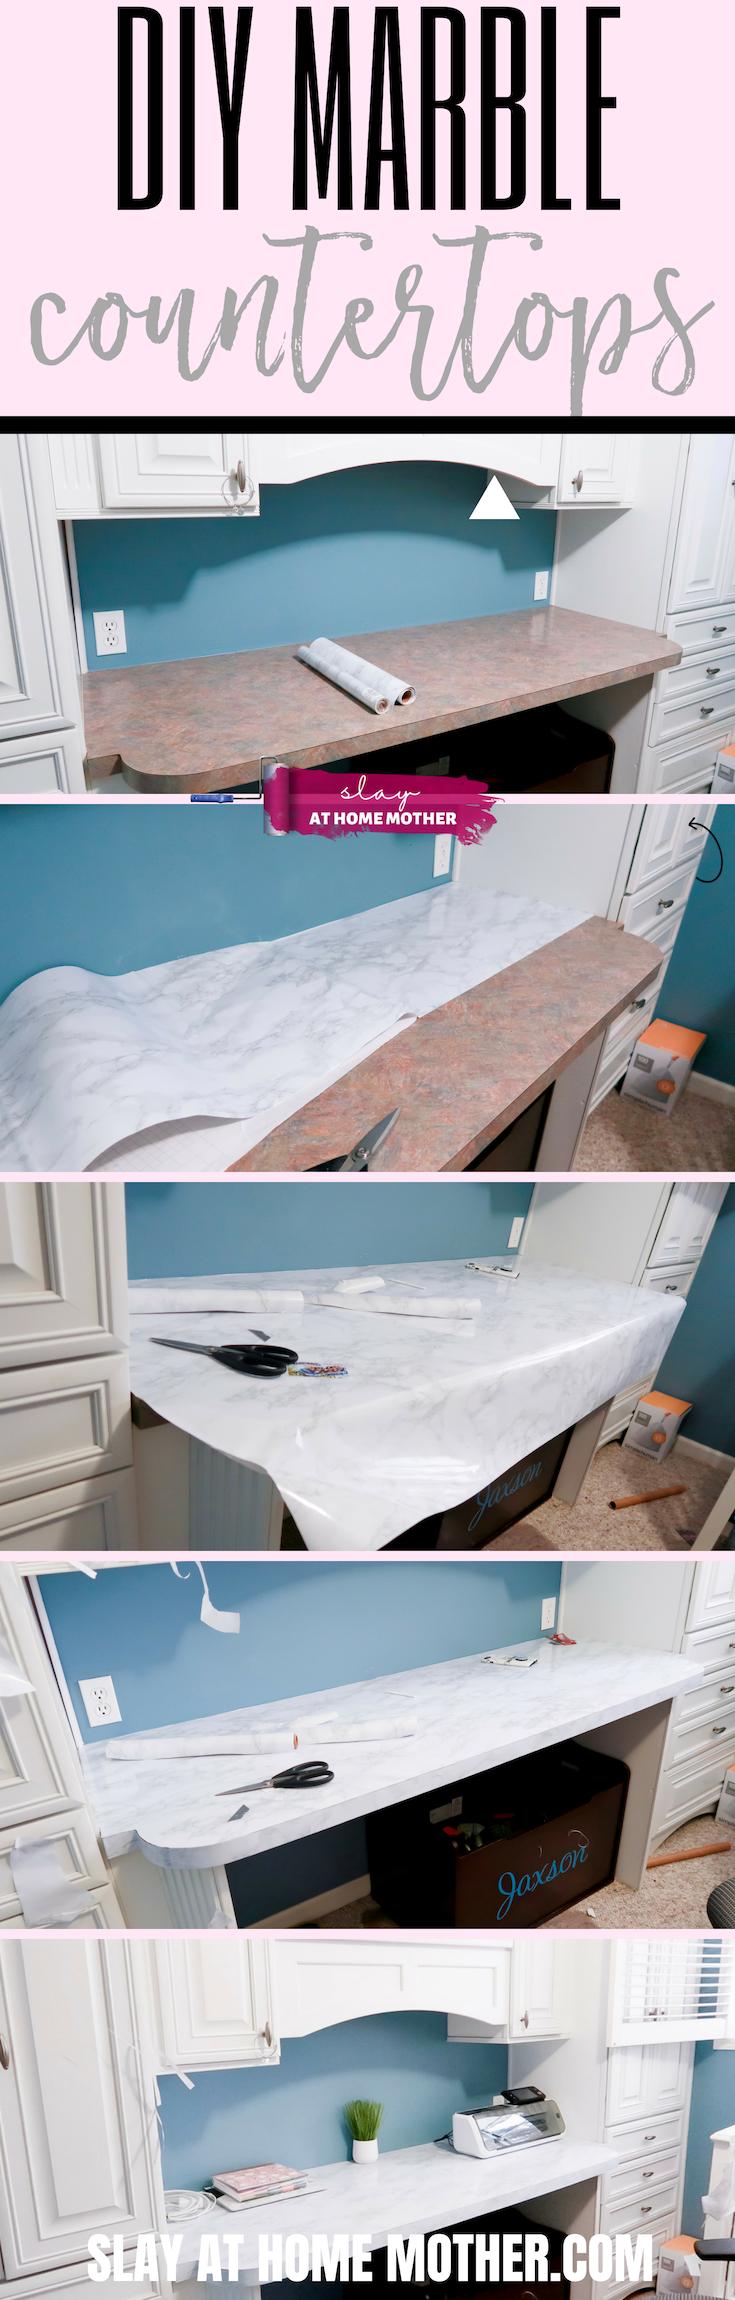 $16 DIY Marble Countertops Using Contact Paper #contactpaper #marble #slayathomemother #diy #homedecor -- https://SLAYathomemother.com